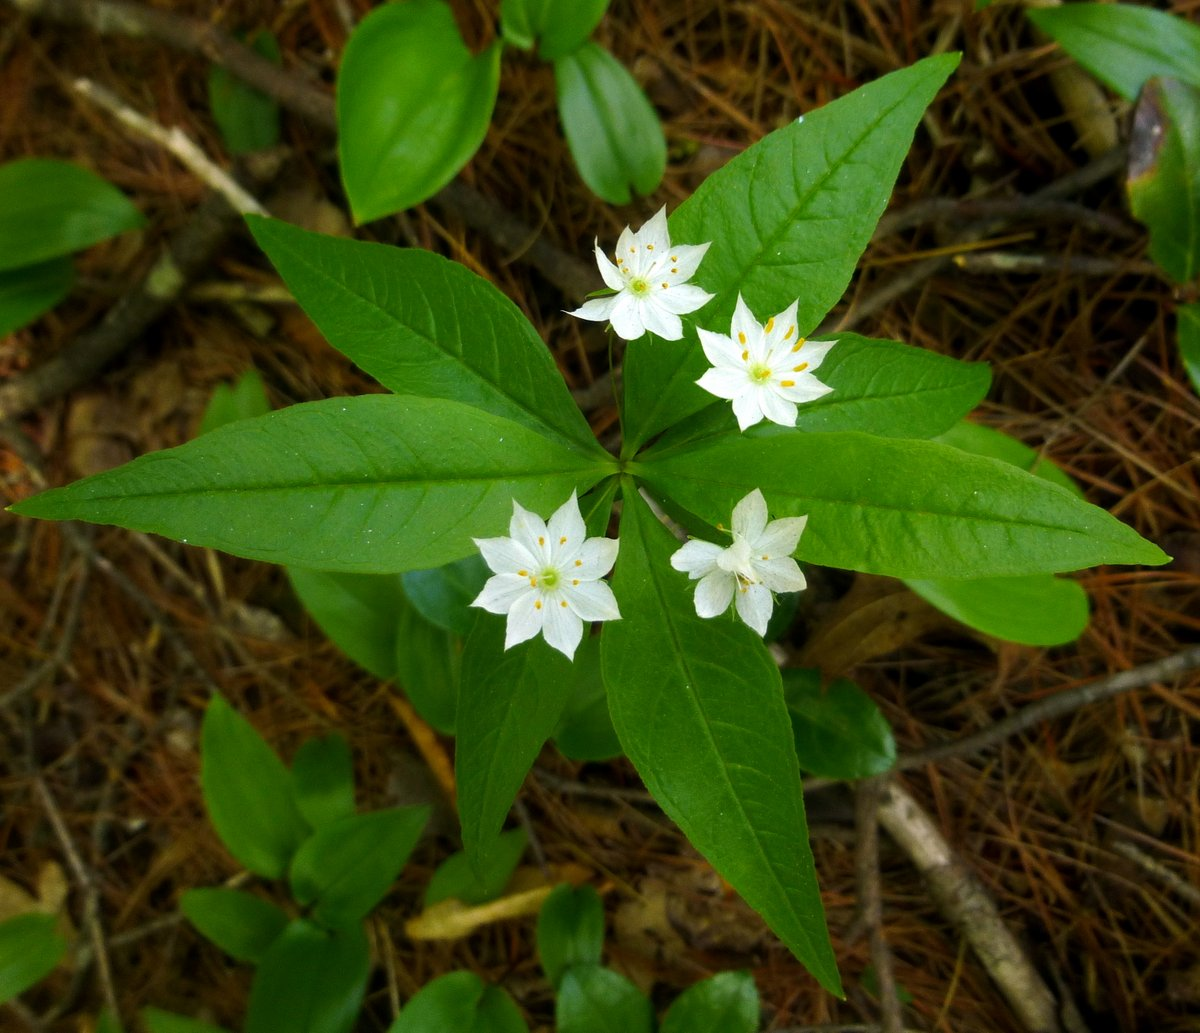 5. Four Flowered Star Flower